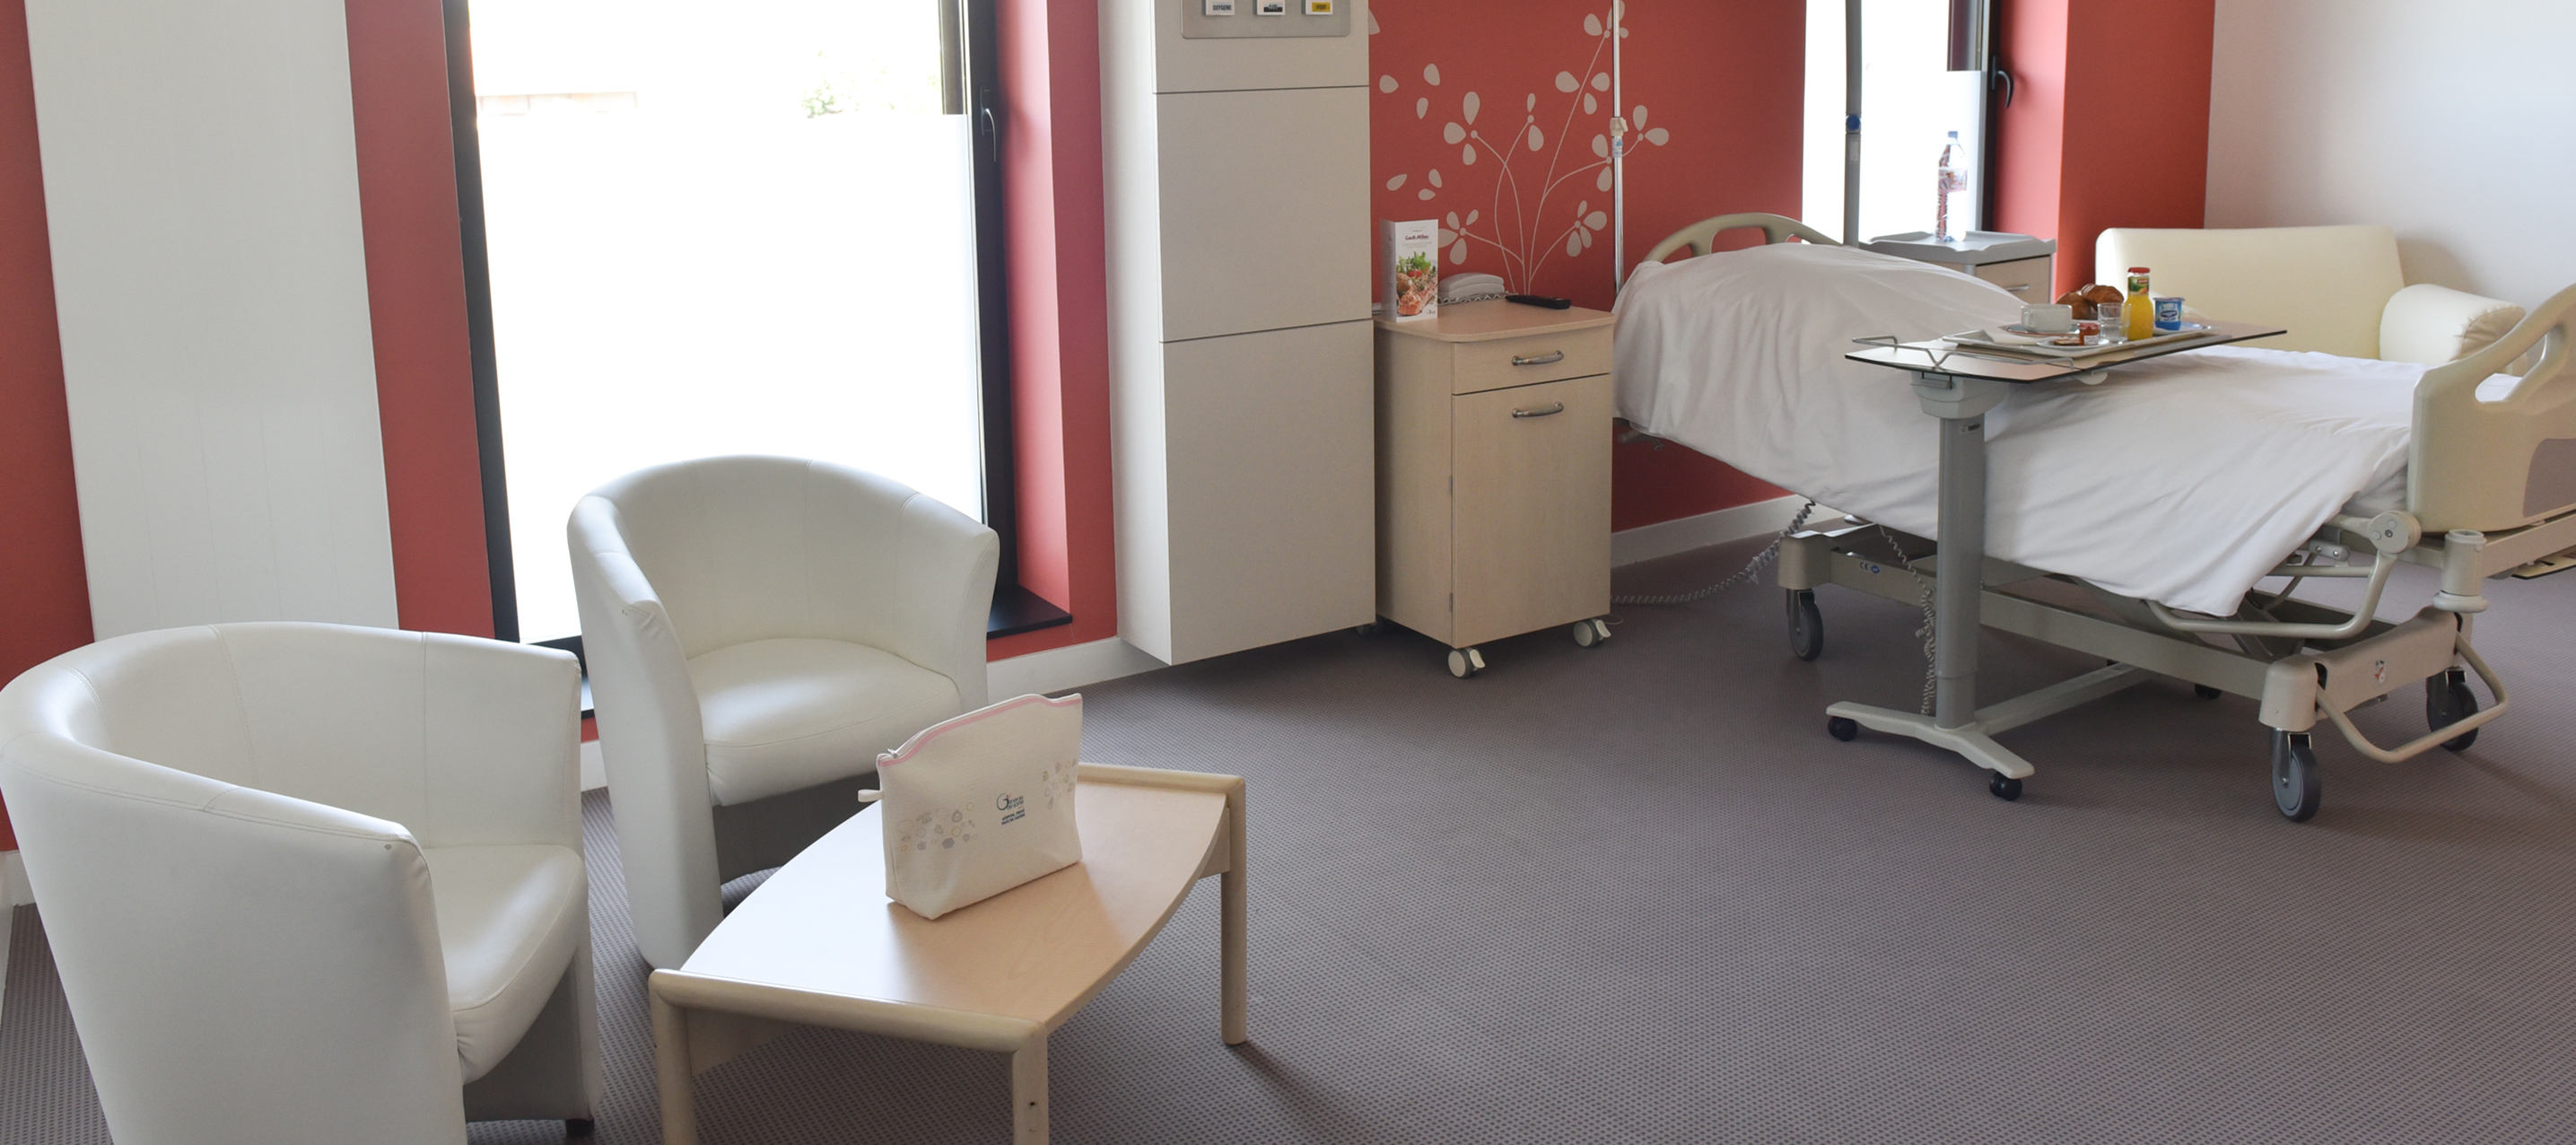 Offres SOLO | Hôpital privé Bois Bernard